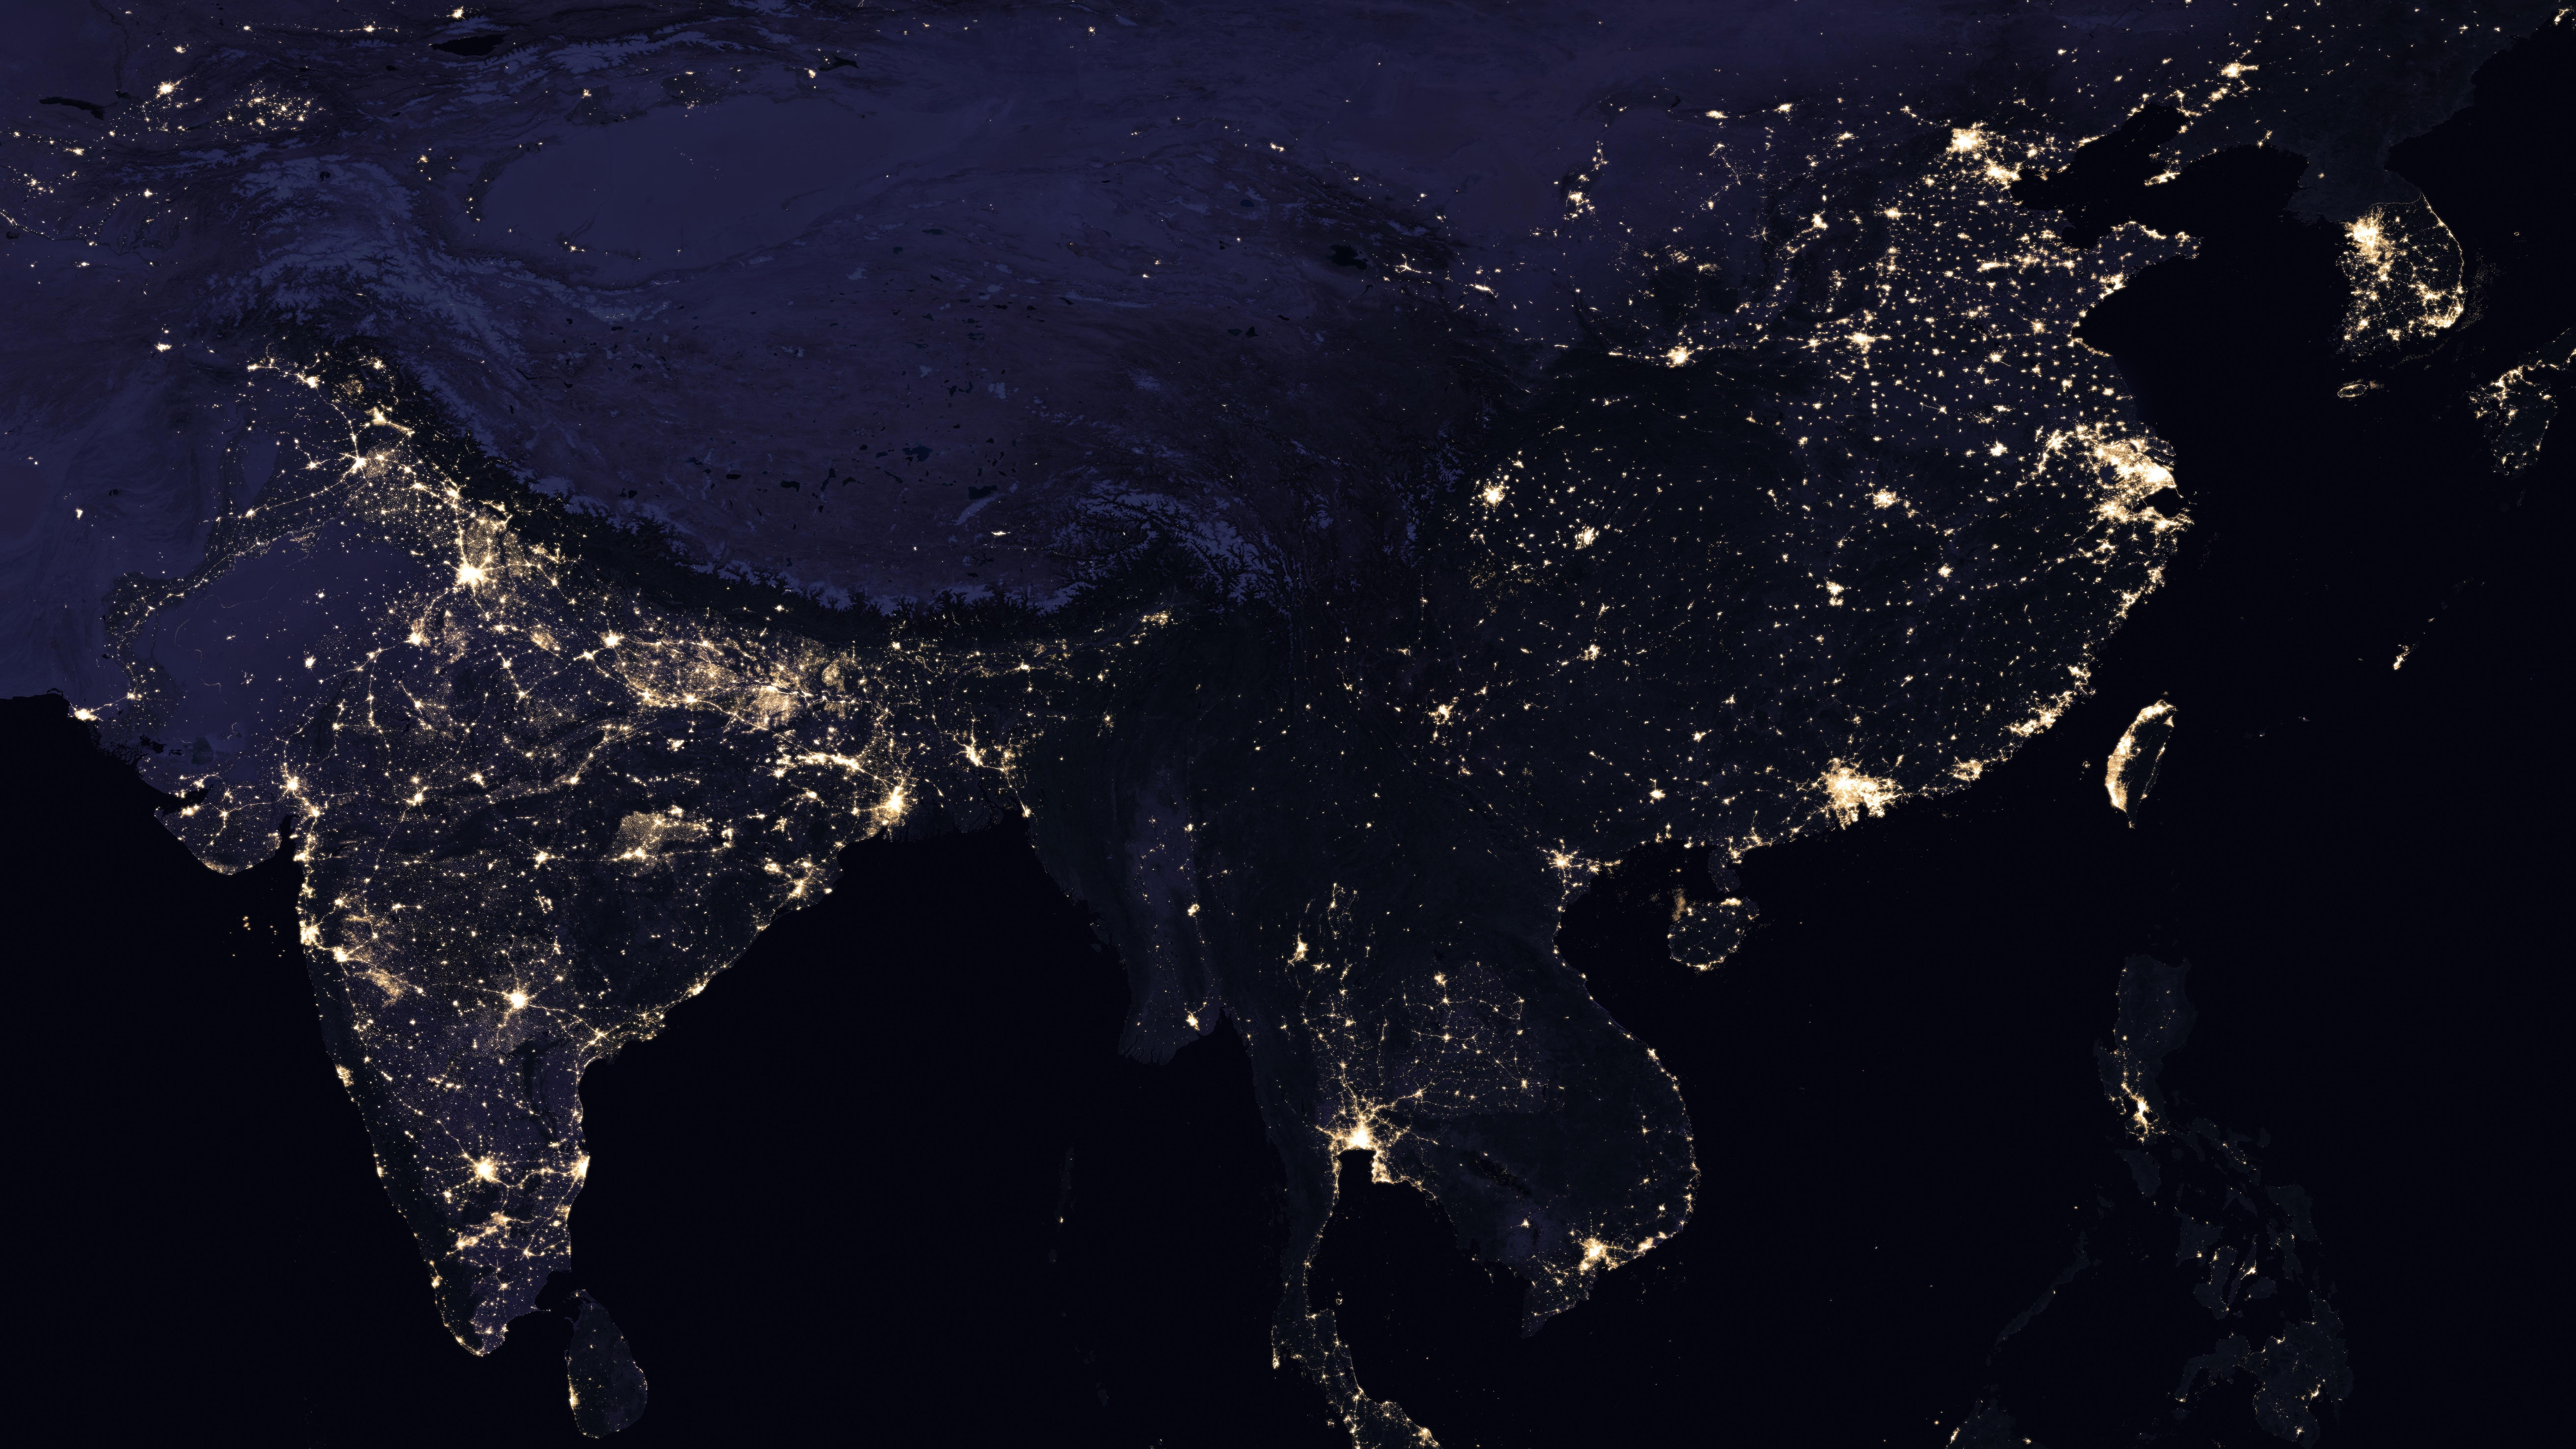 Night Lights of India, China & the Indochinese Peninsula 2016 wallpaper